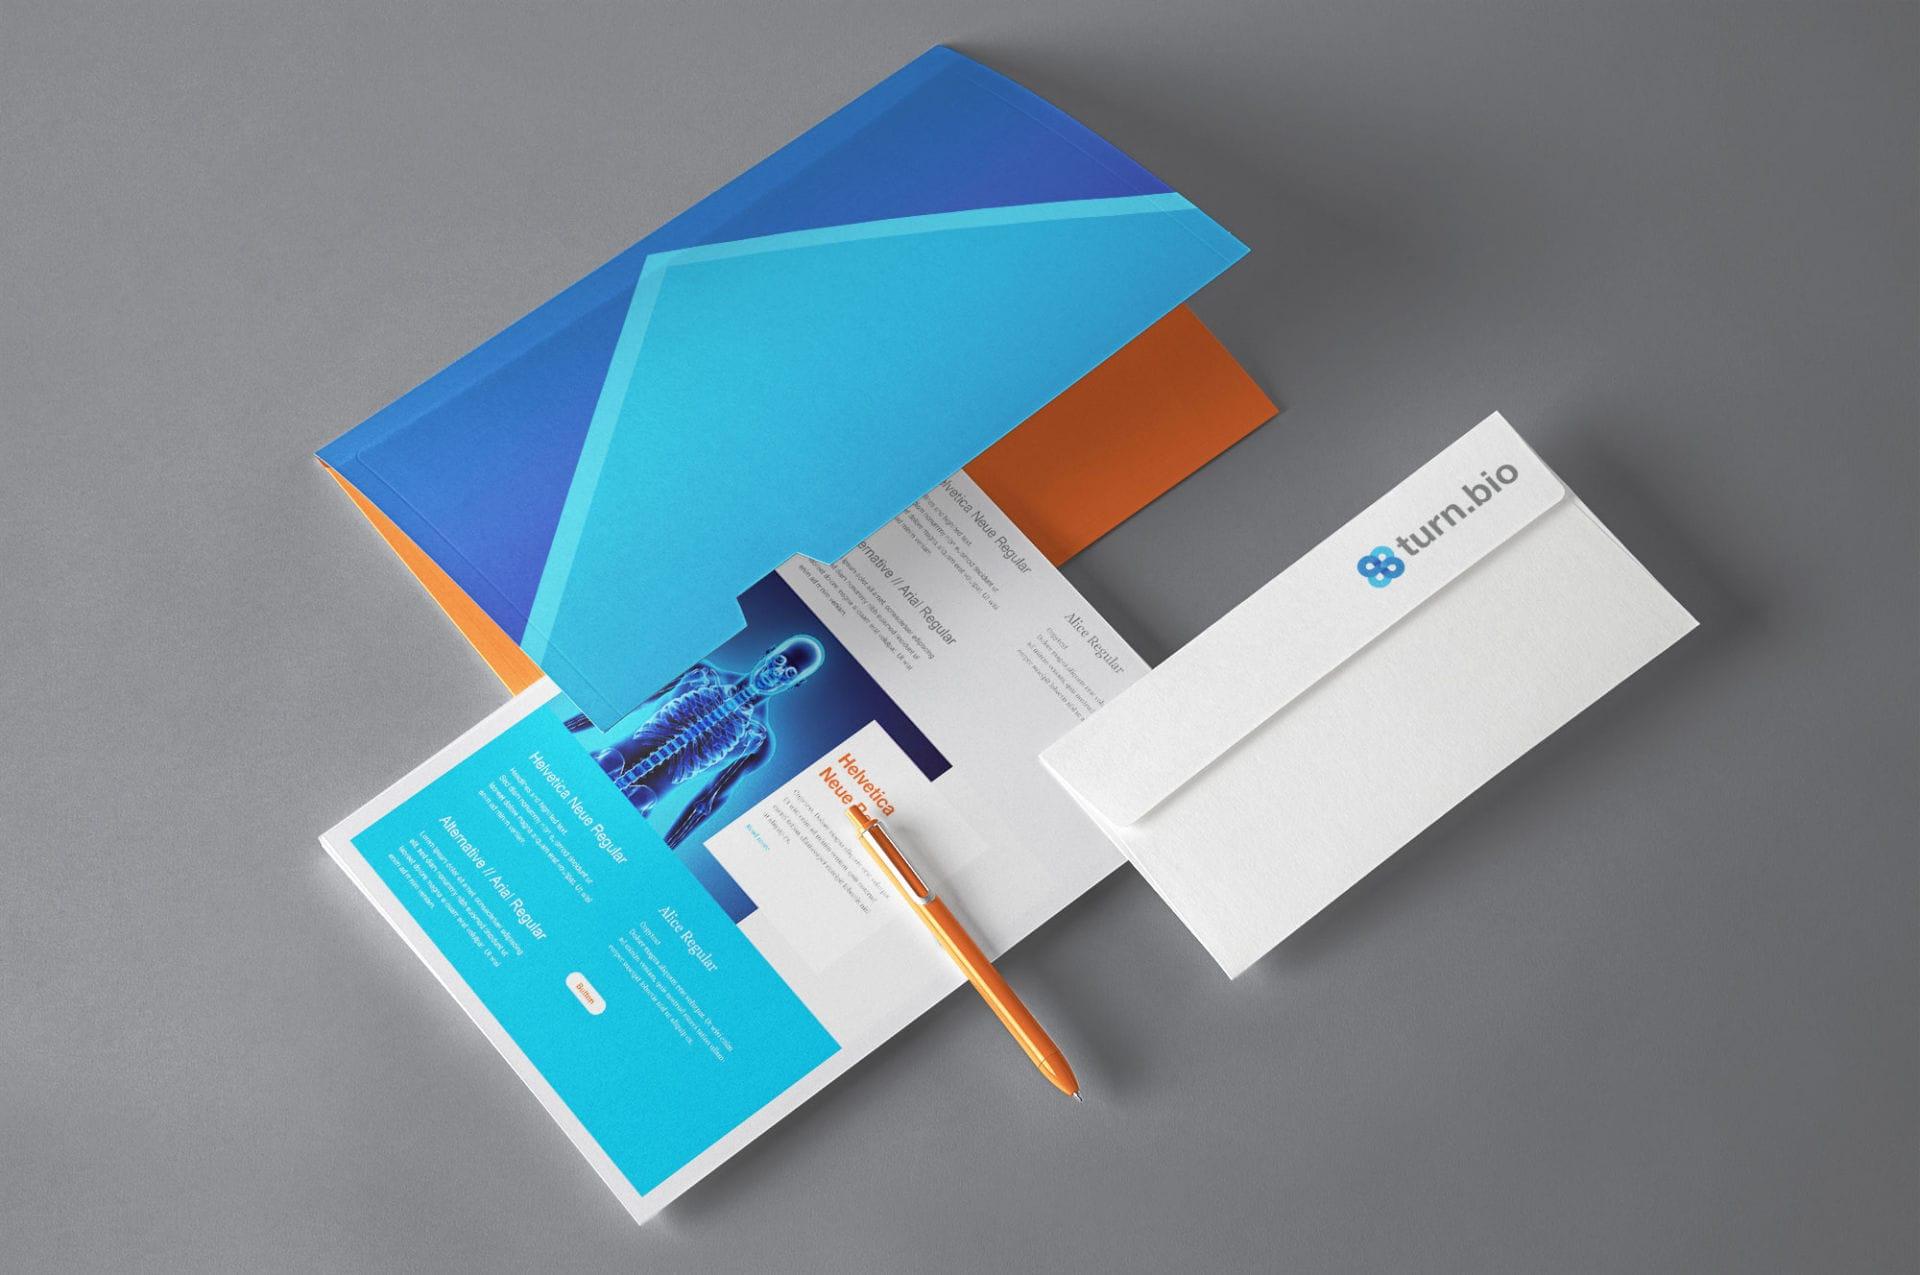 Office-Buisness-Stationery-Mockup